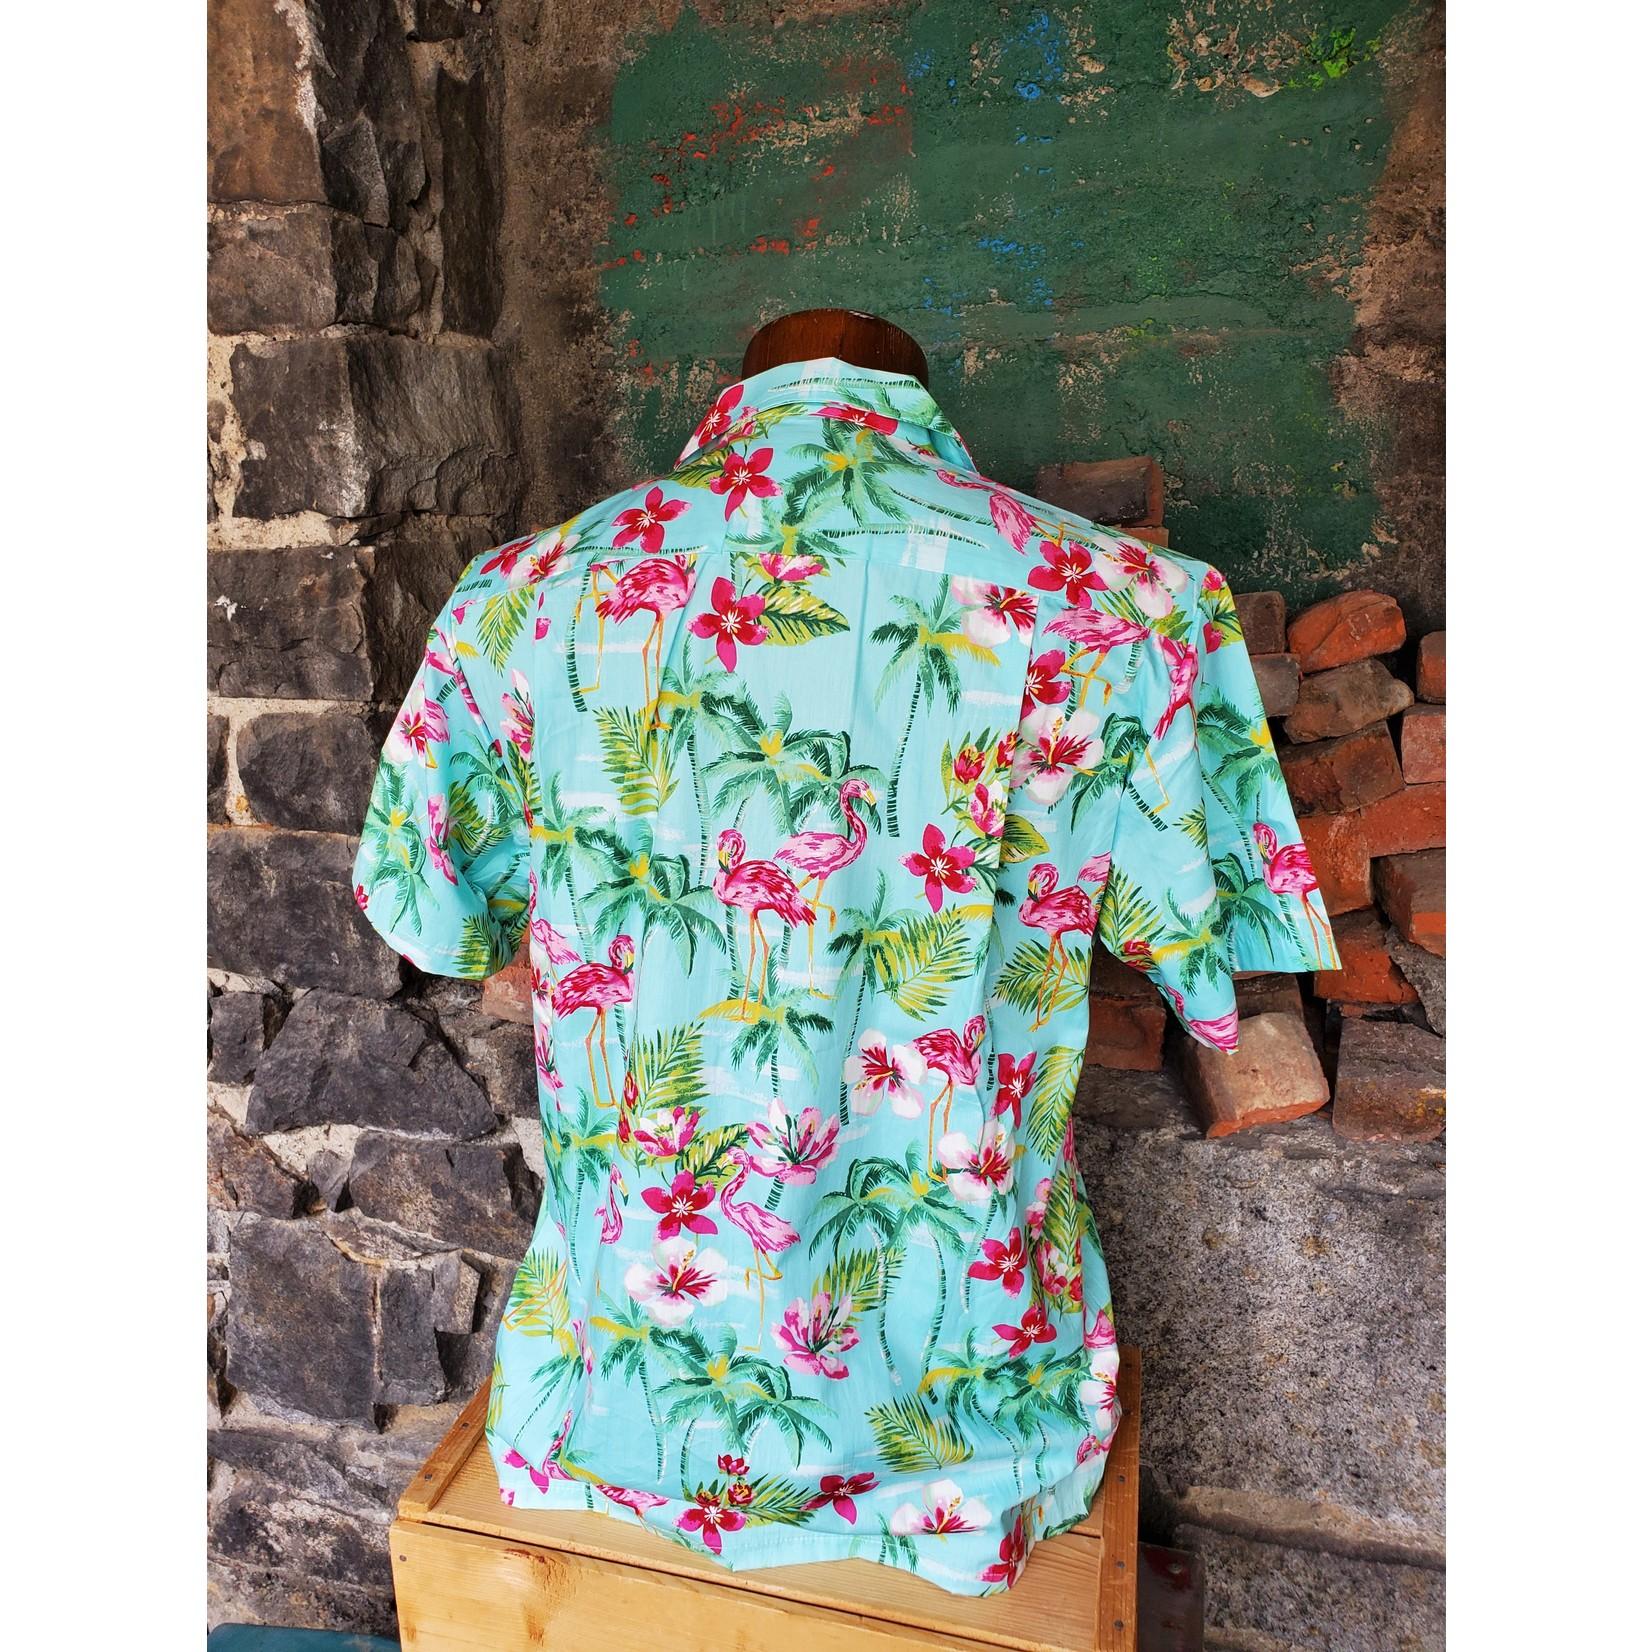 RJC Authentic Hawaiian Shirt - Turquoise Flamingo Floral